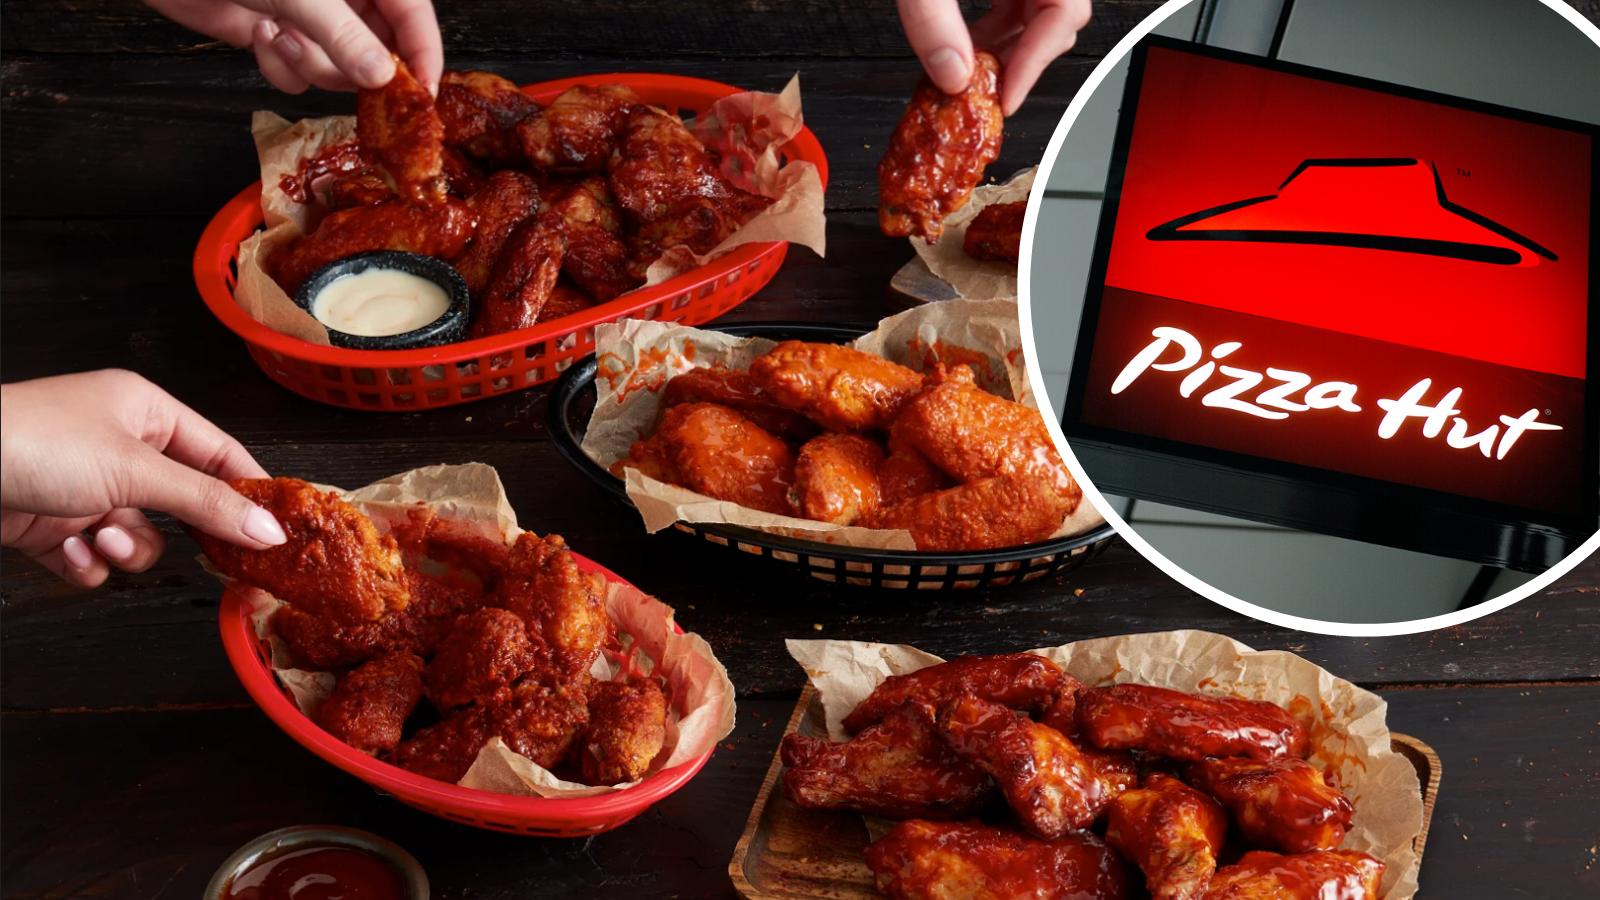 Pizza Hut is selling $1 wings all week